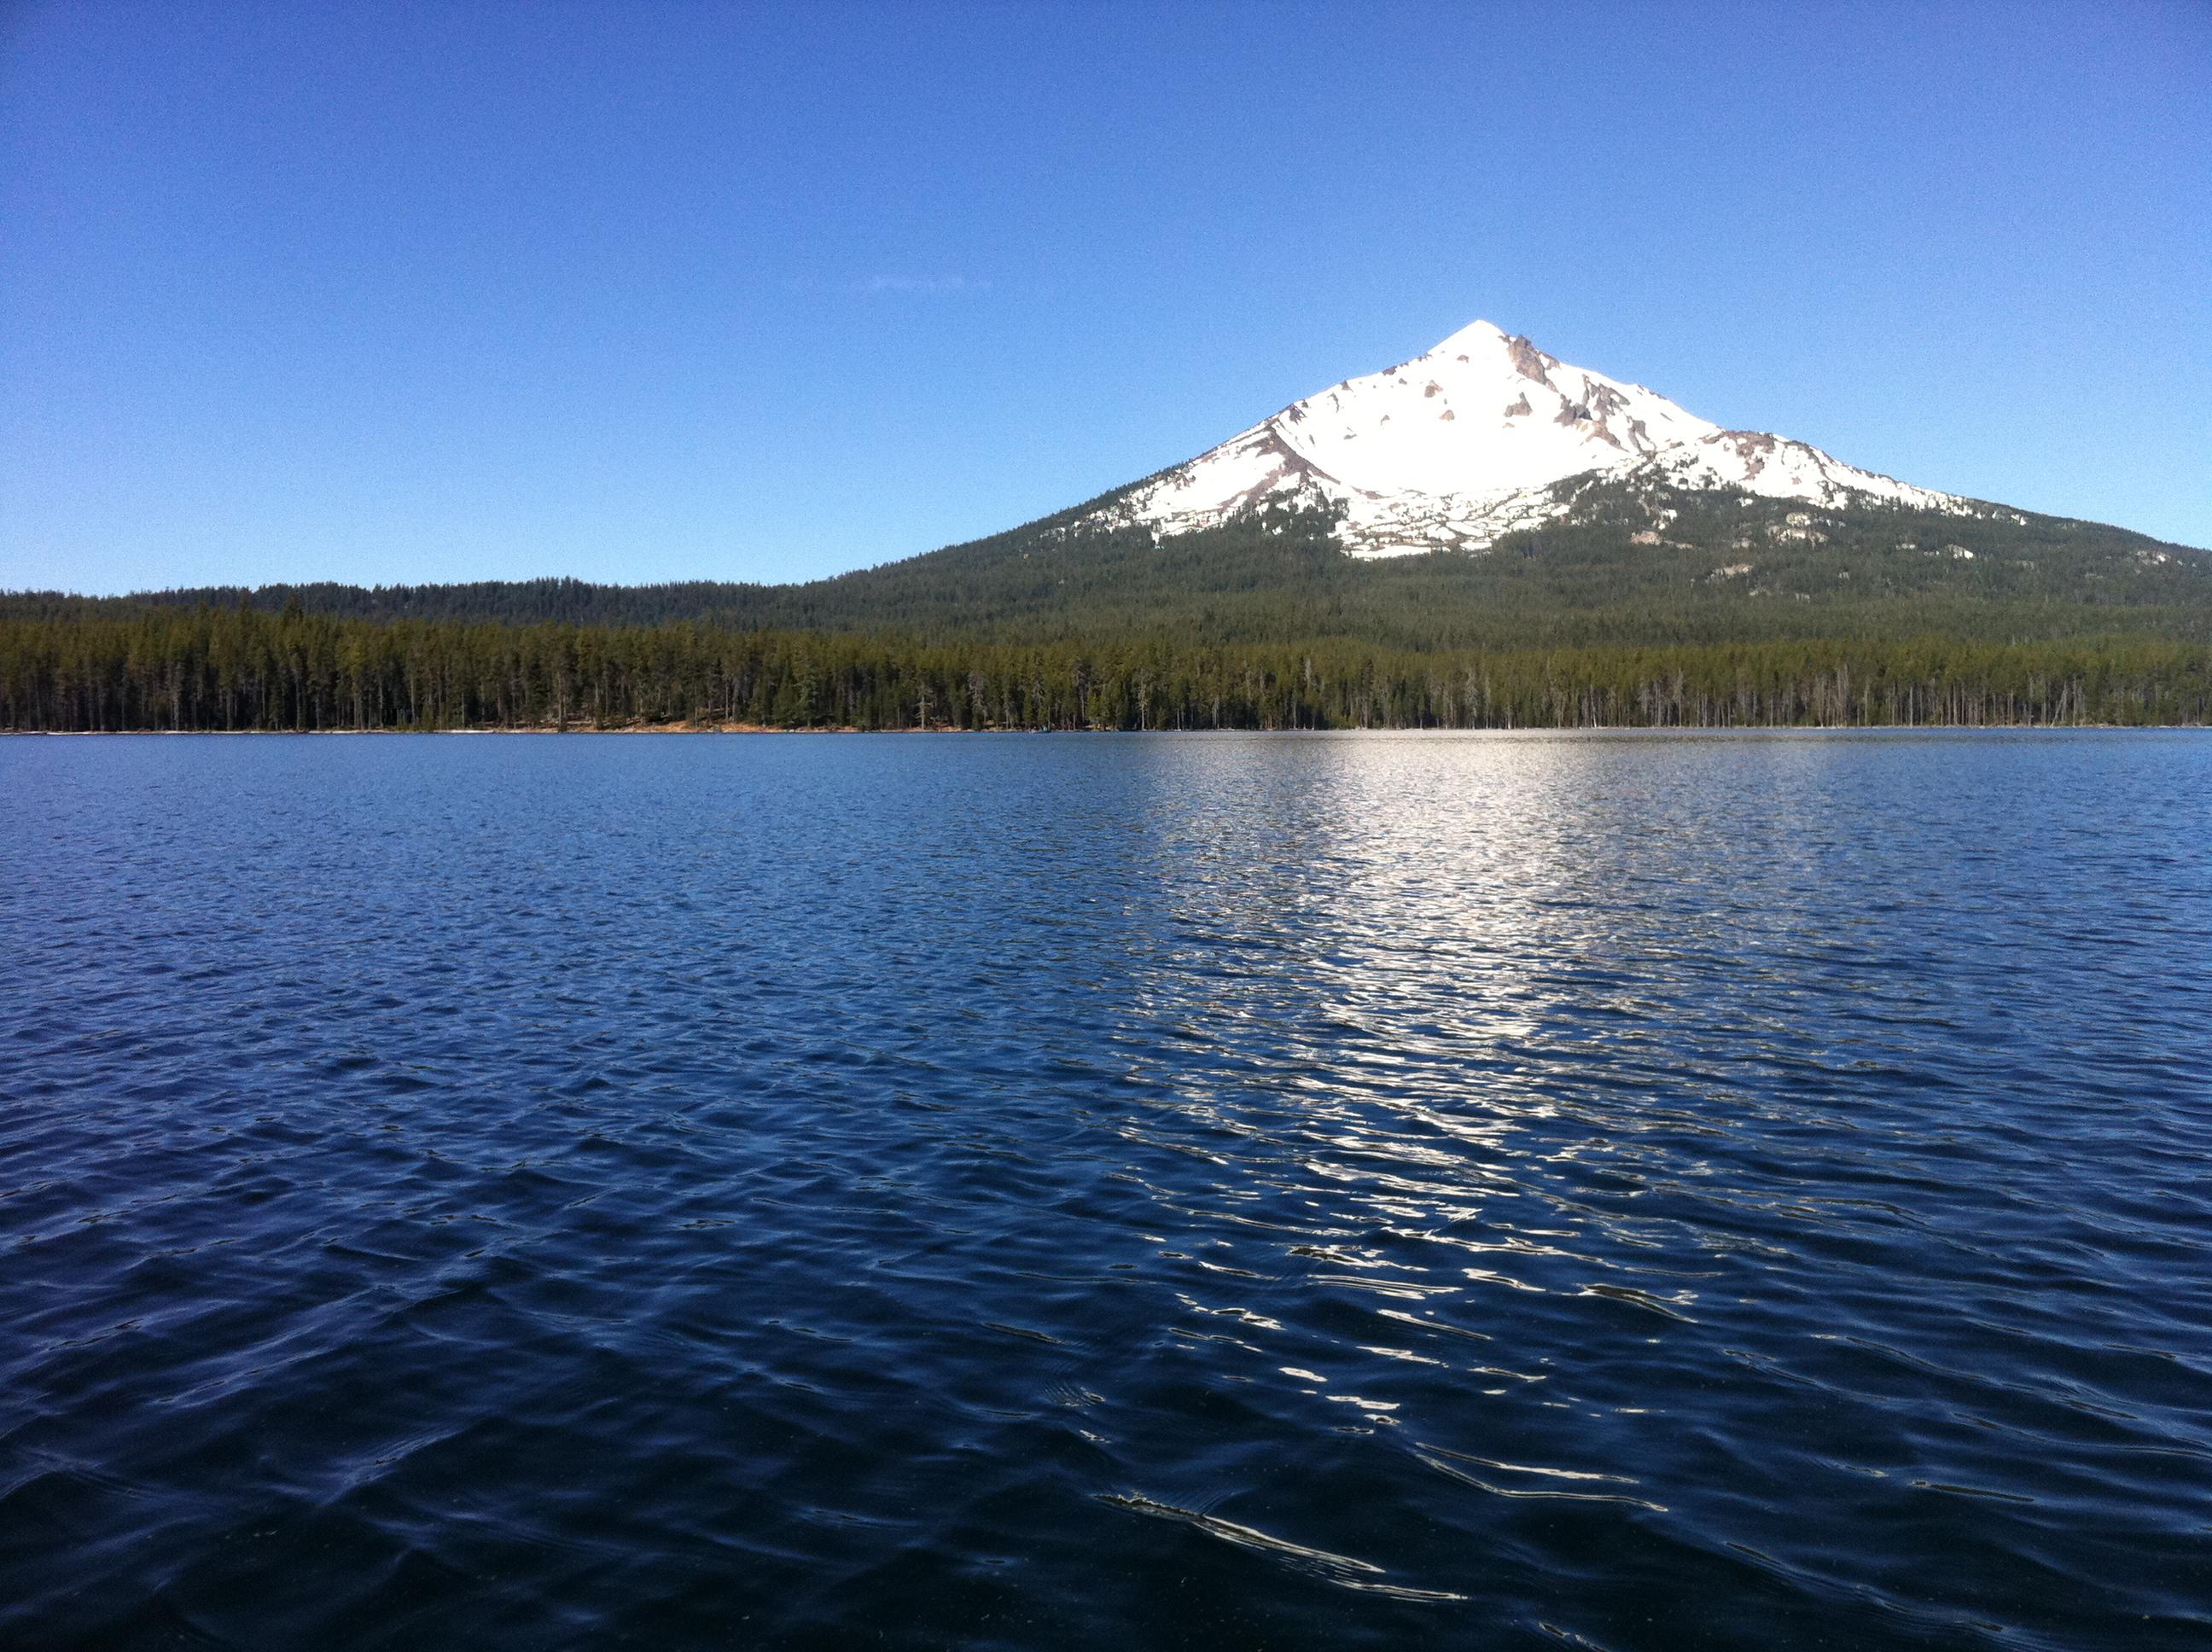 Fourmile Lake & Mt. McLoughlin Views in Southern Oregon